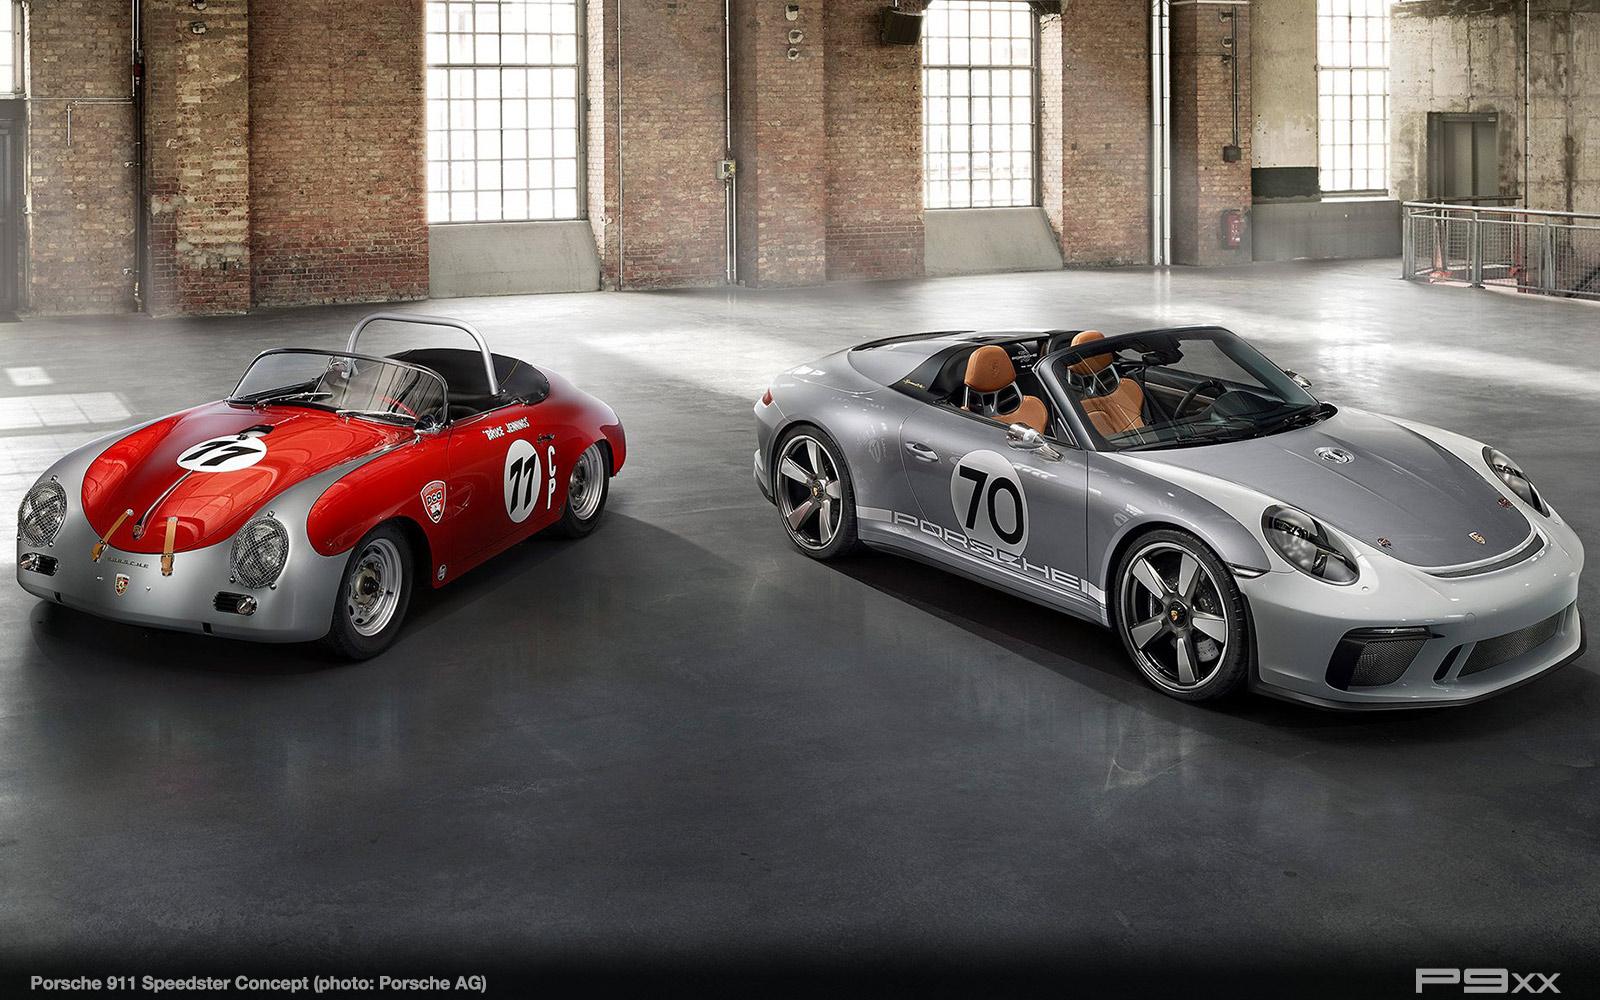 Porsche-911-Speedster-Concept-2018-299